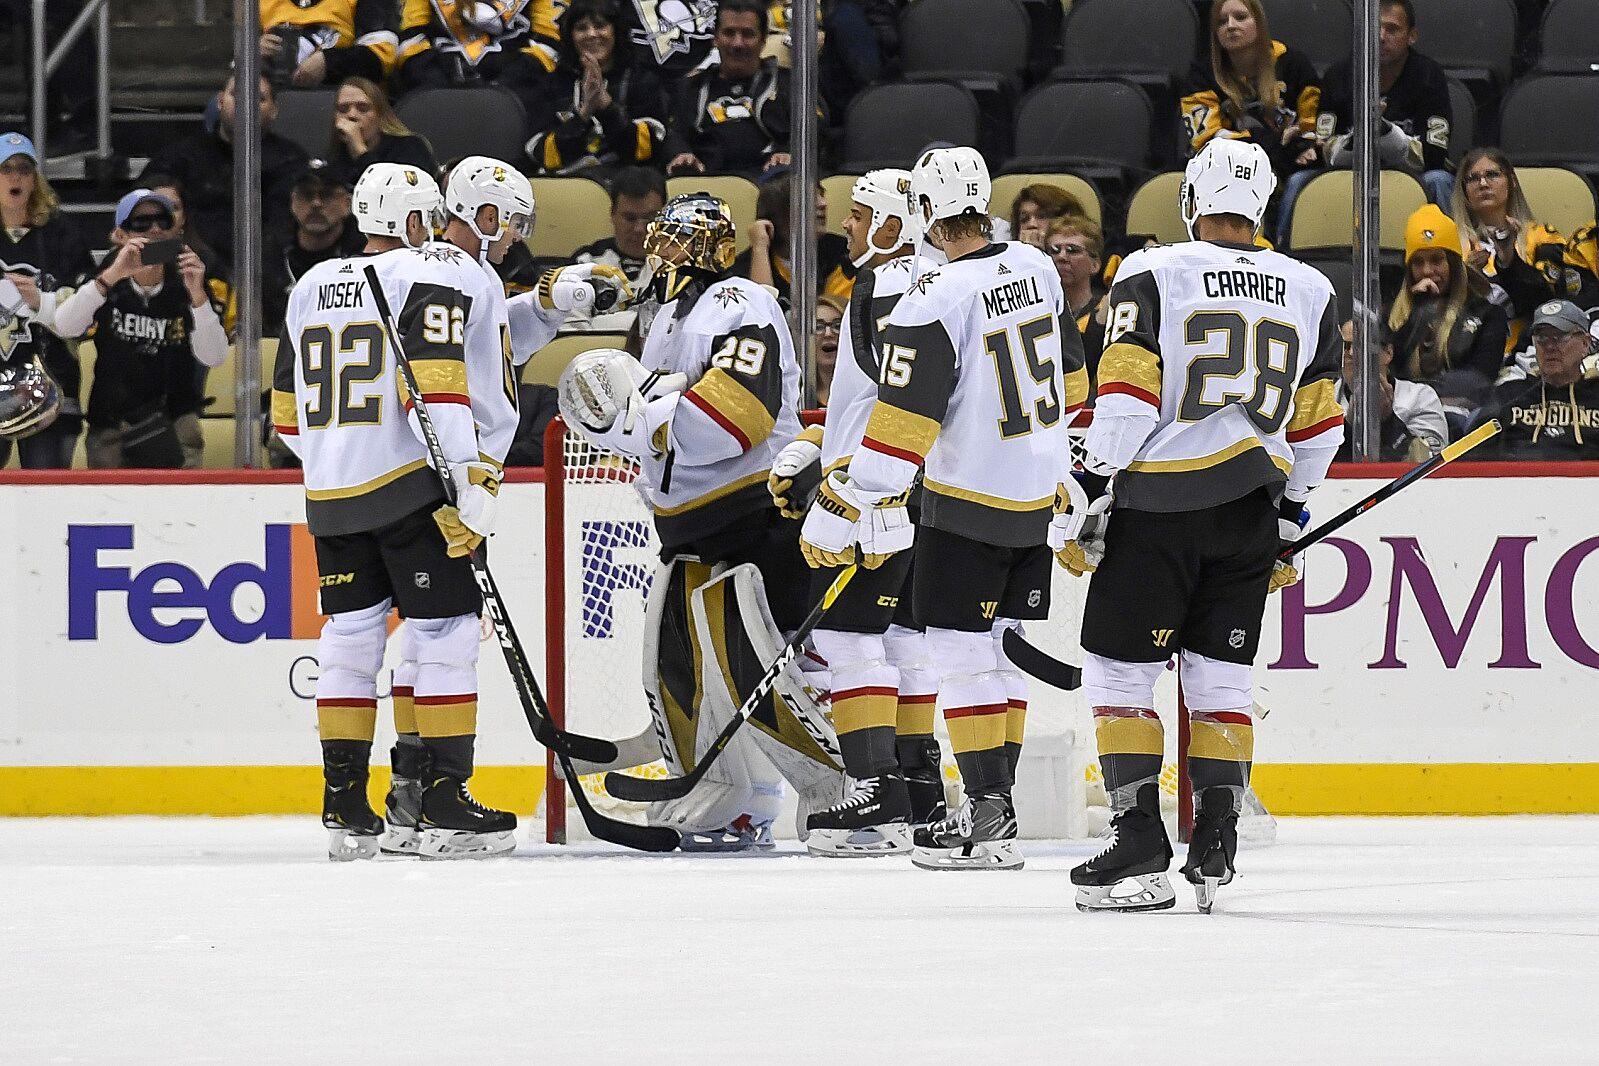 Vegas Golden Knights: Three Takeaways from Penguins shutout